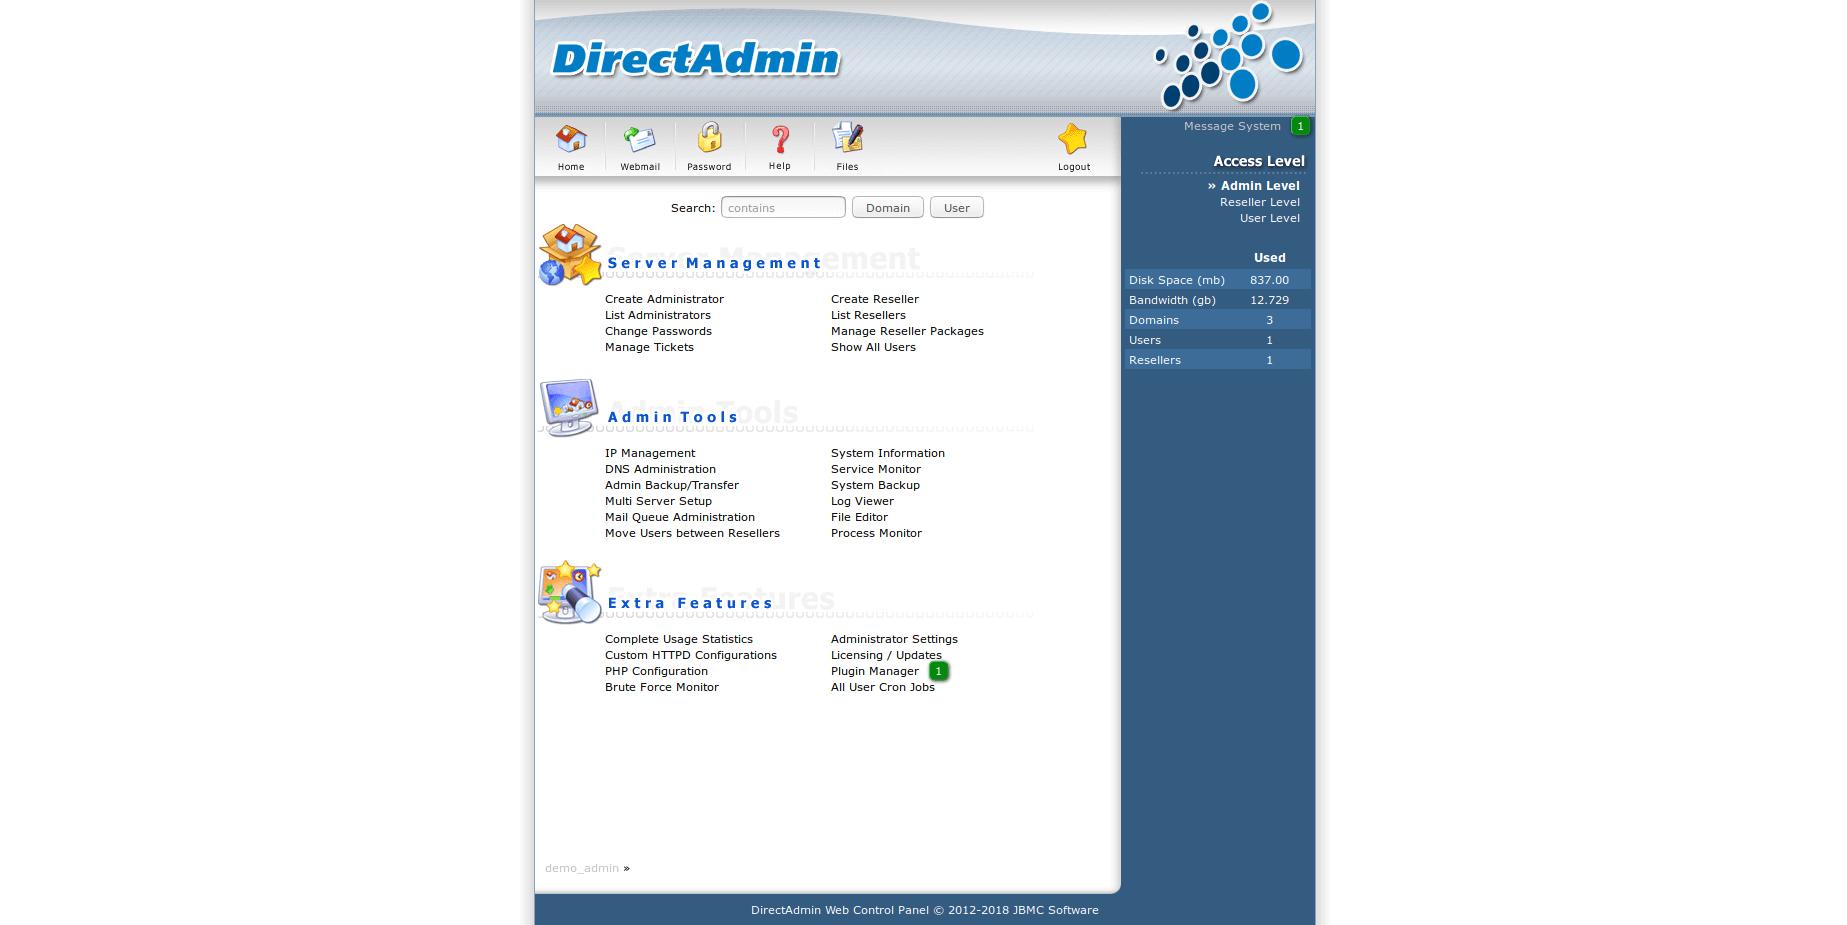 DirectAdmin admin view